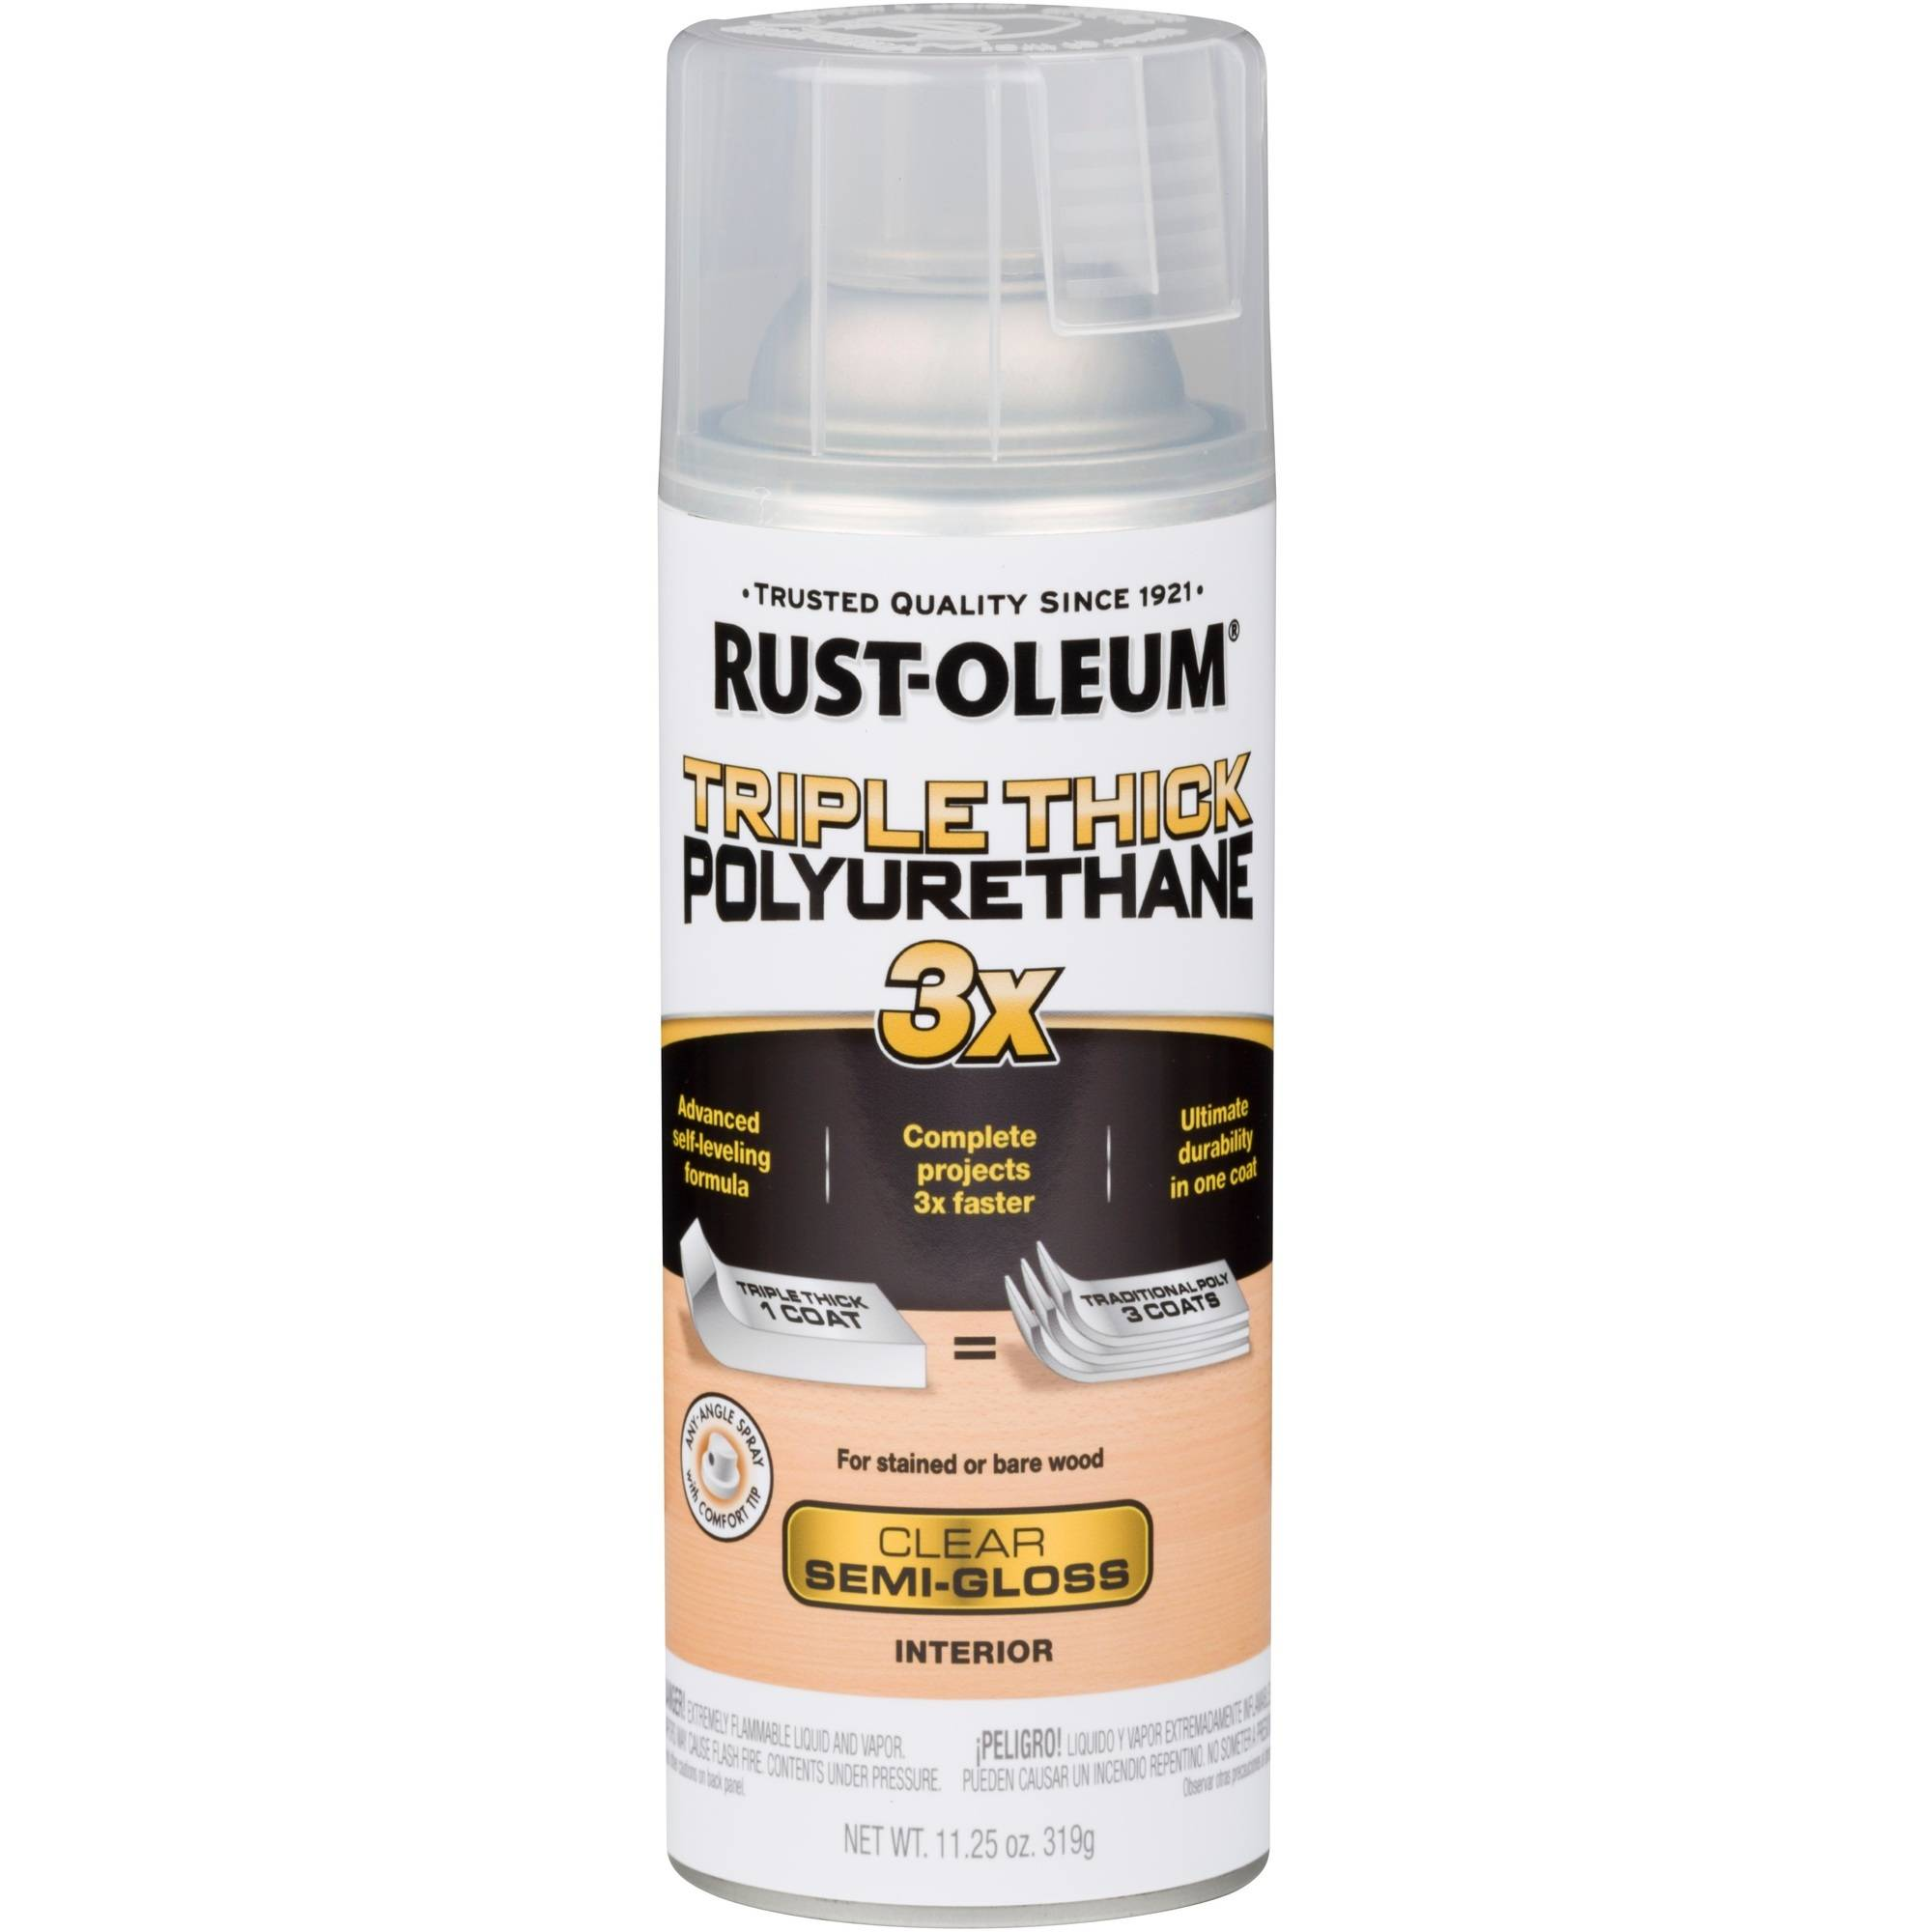 (3 Pack) Rust-Oleum Triple Thick Polyurethane Spray